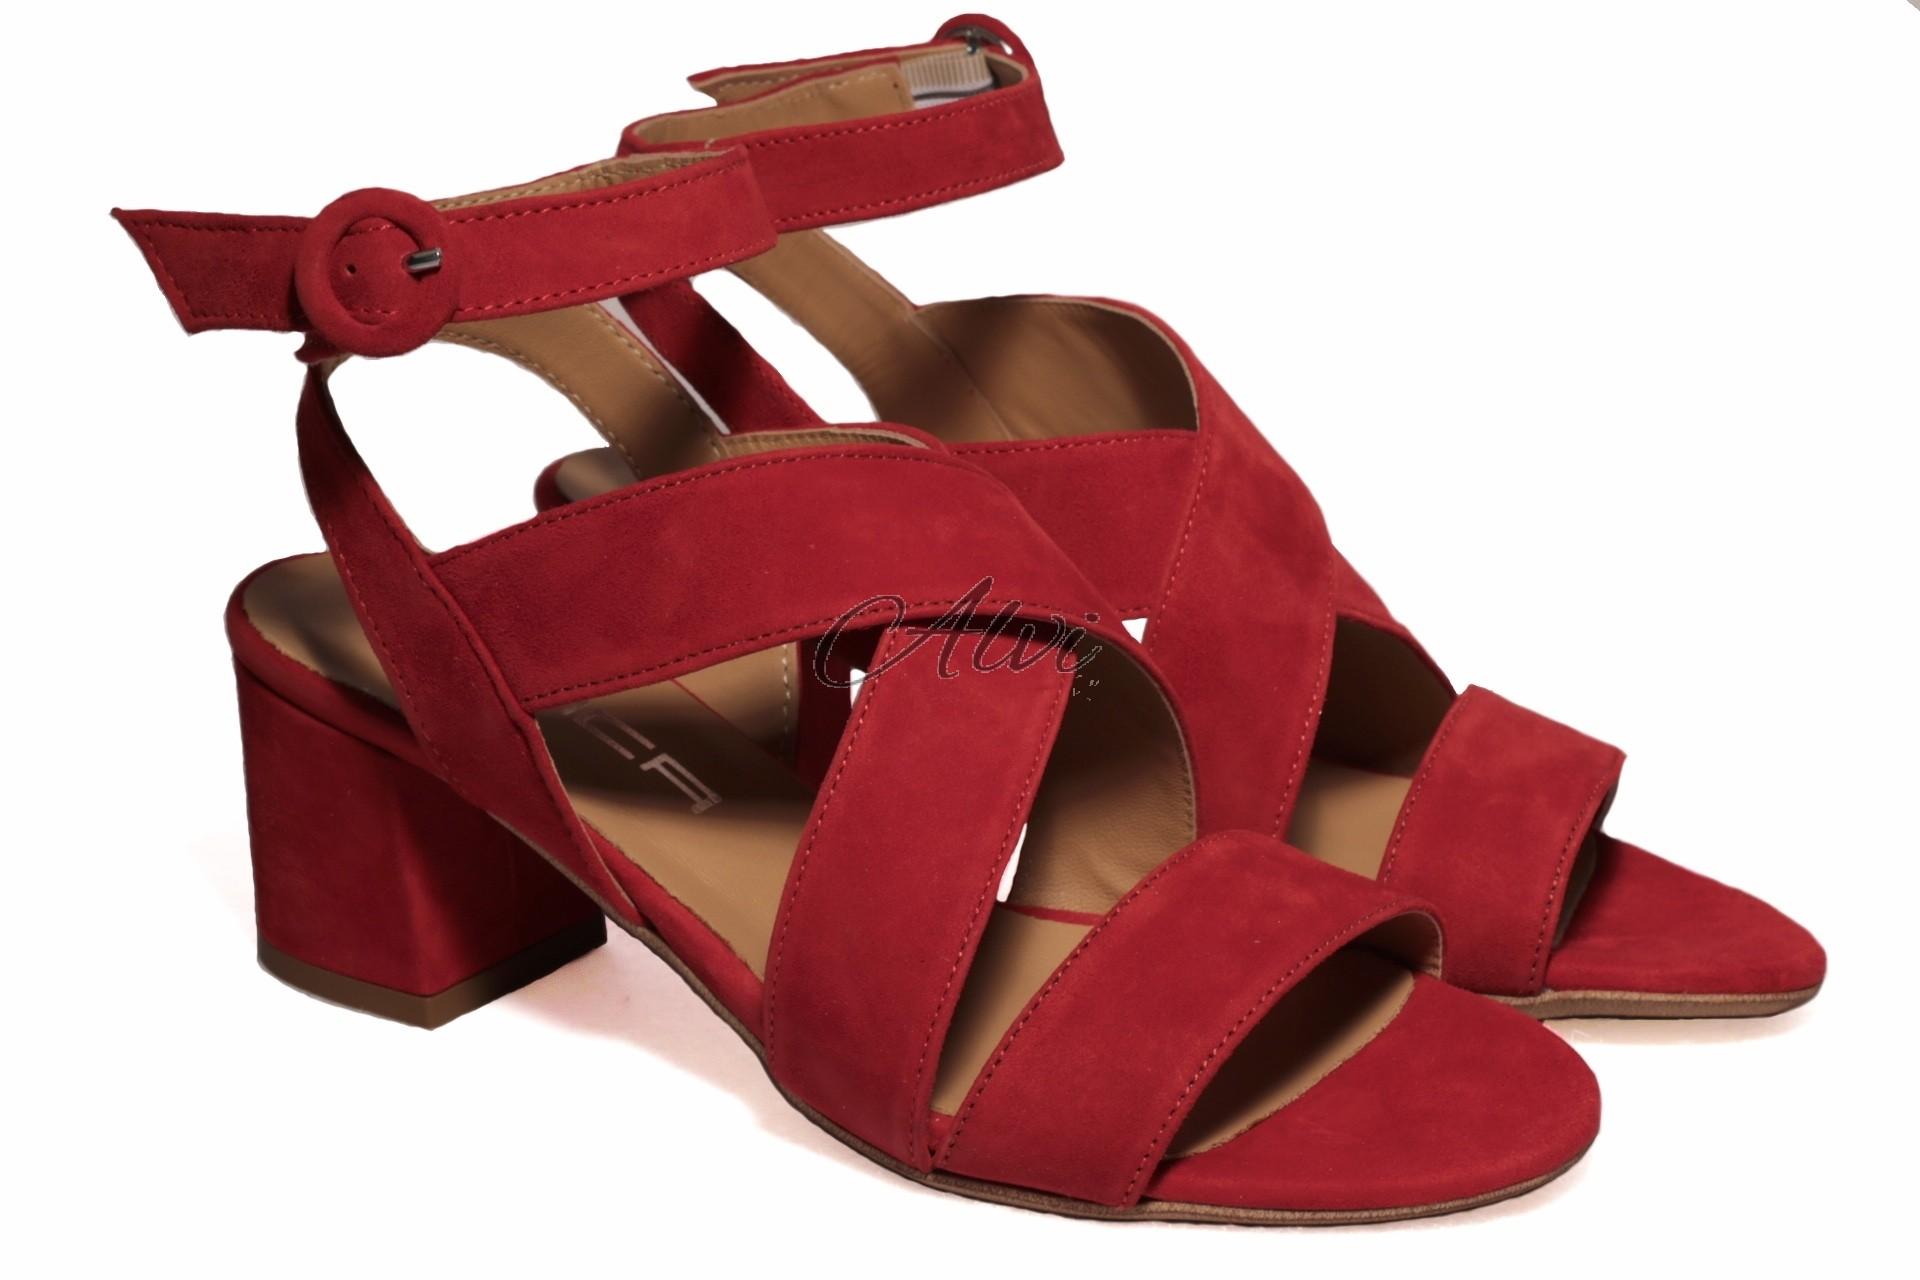 260f8ca65f582 Sandali rossi tacco medio